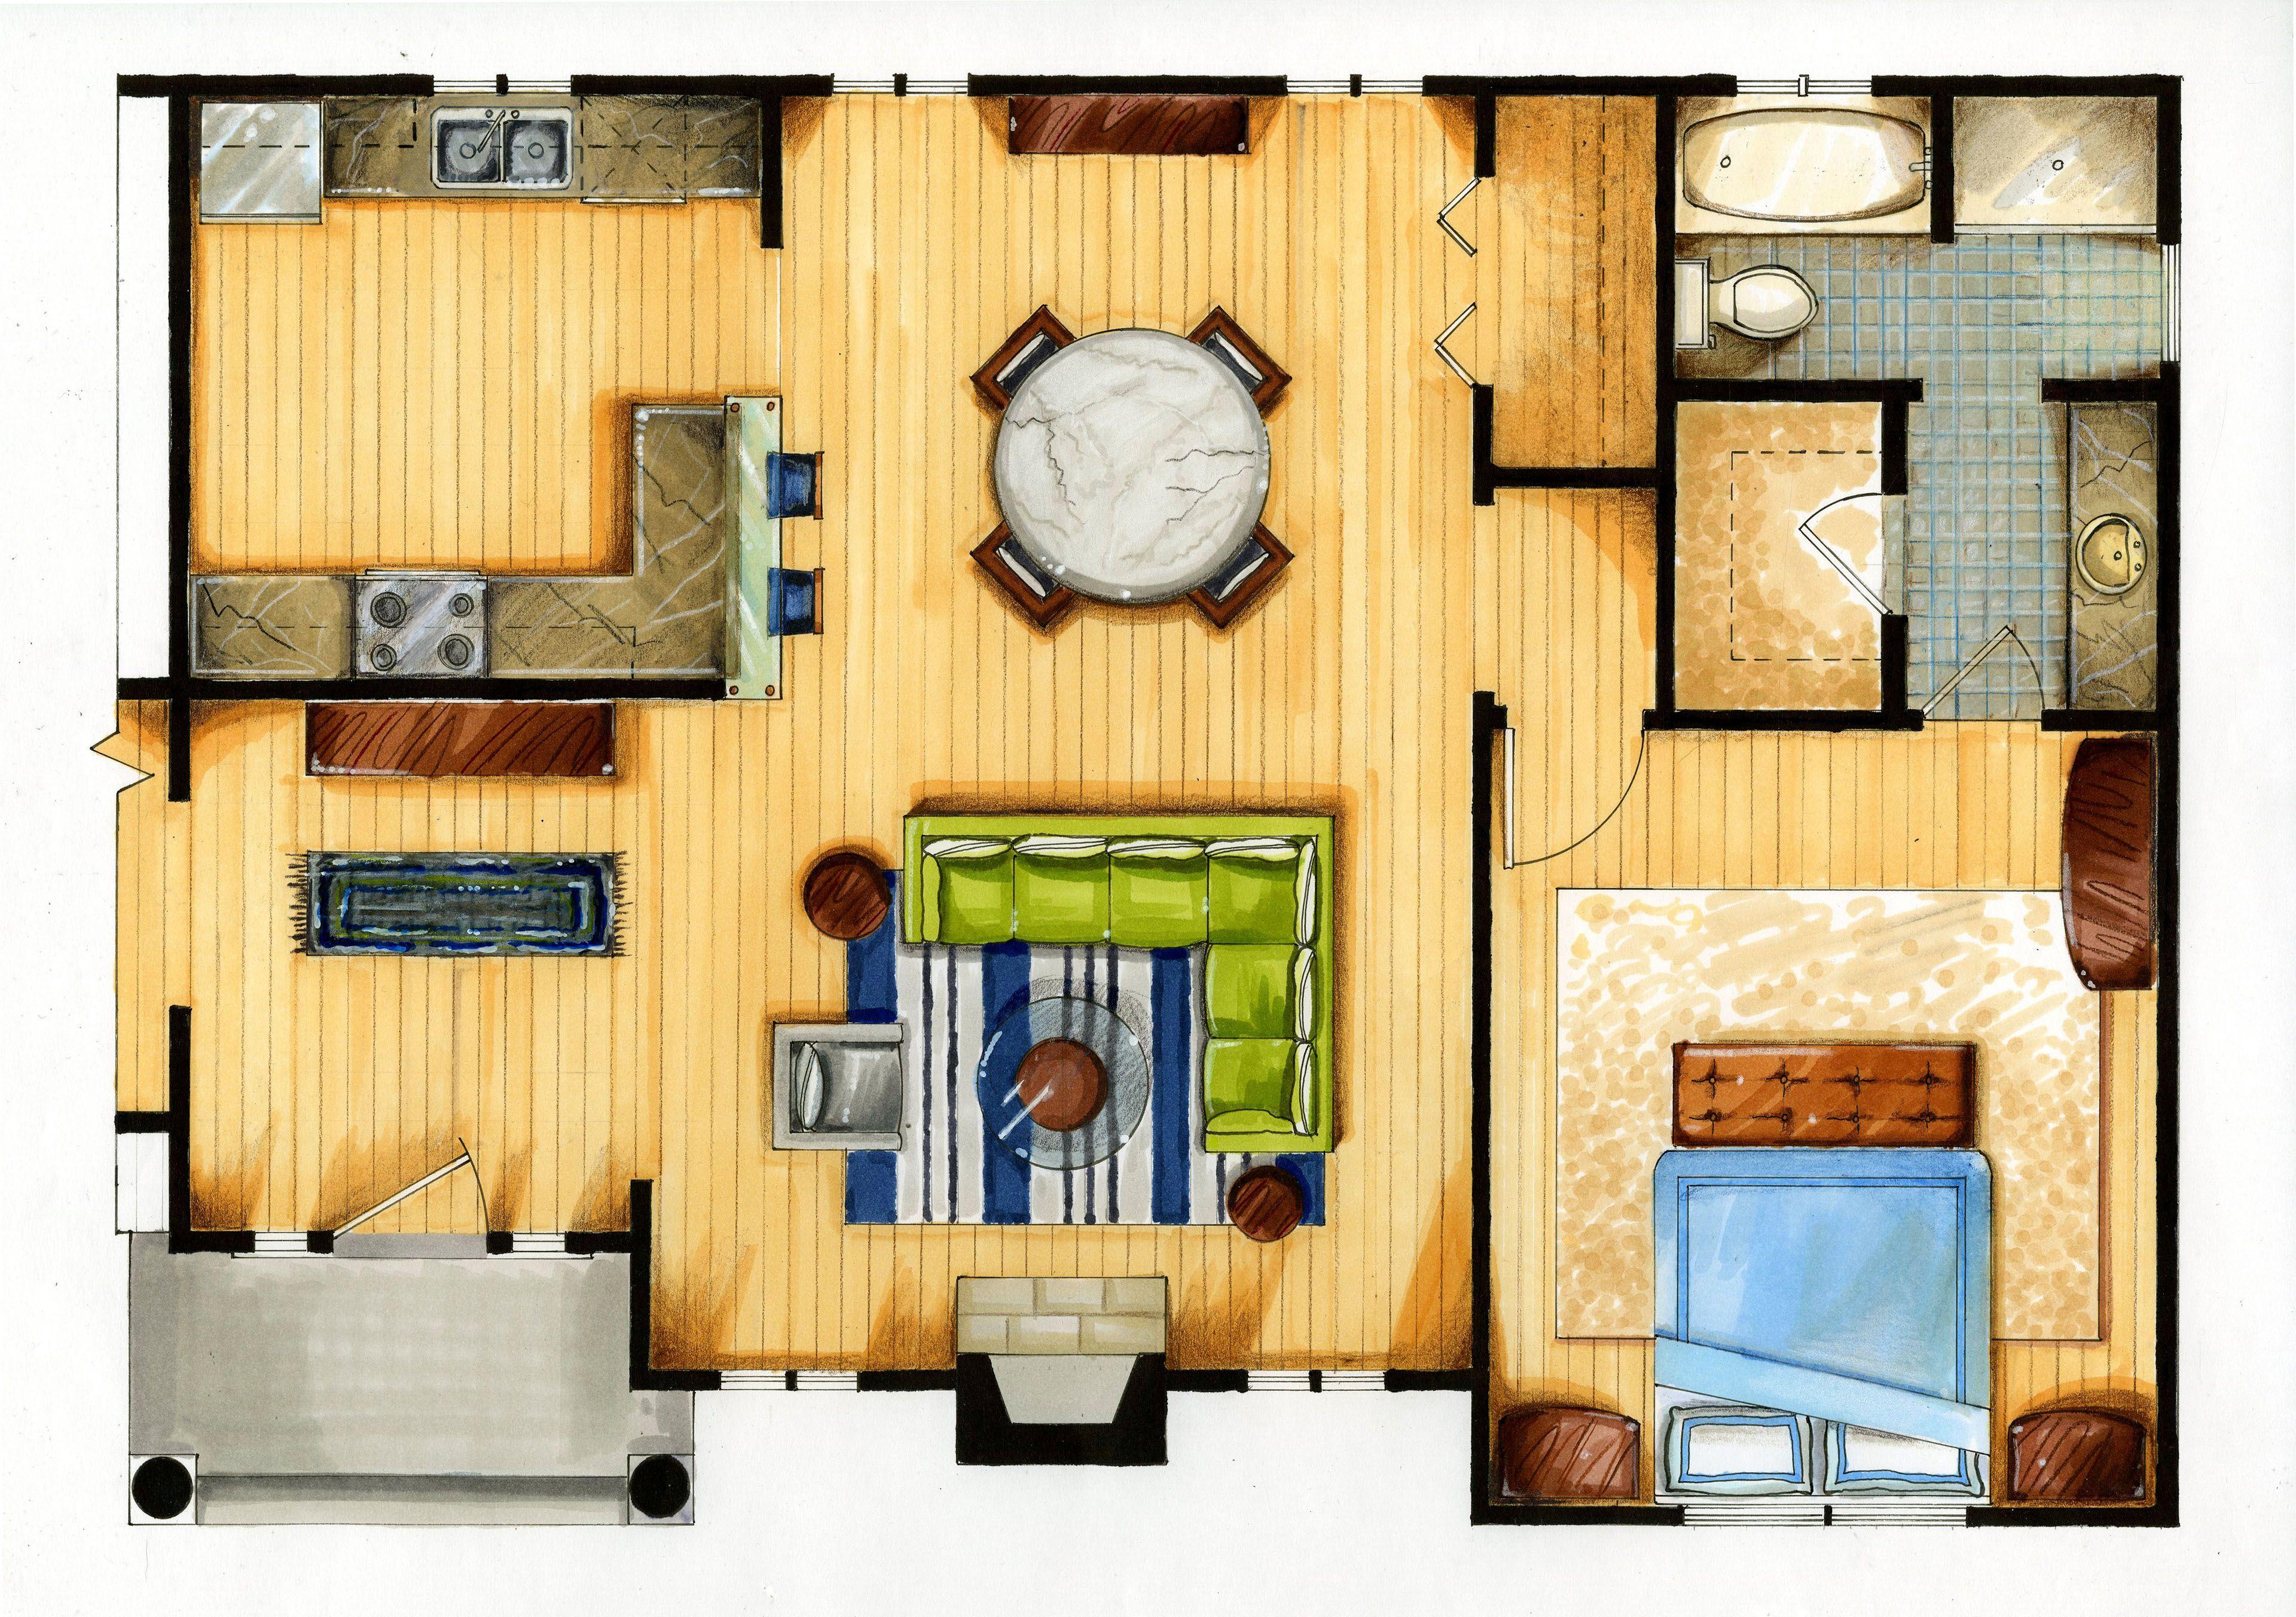 20a41432544397.5689f2603d66c.jpg (3840×2704) | Floor plan and ... on